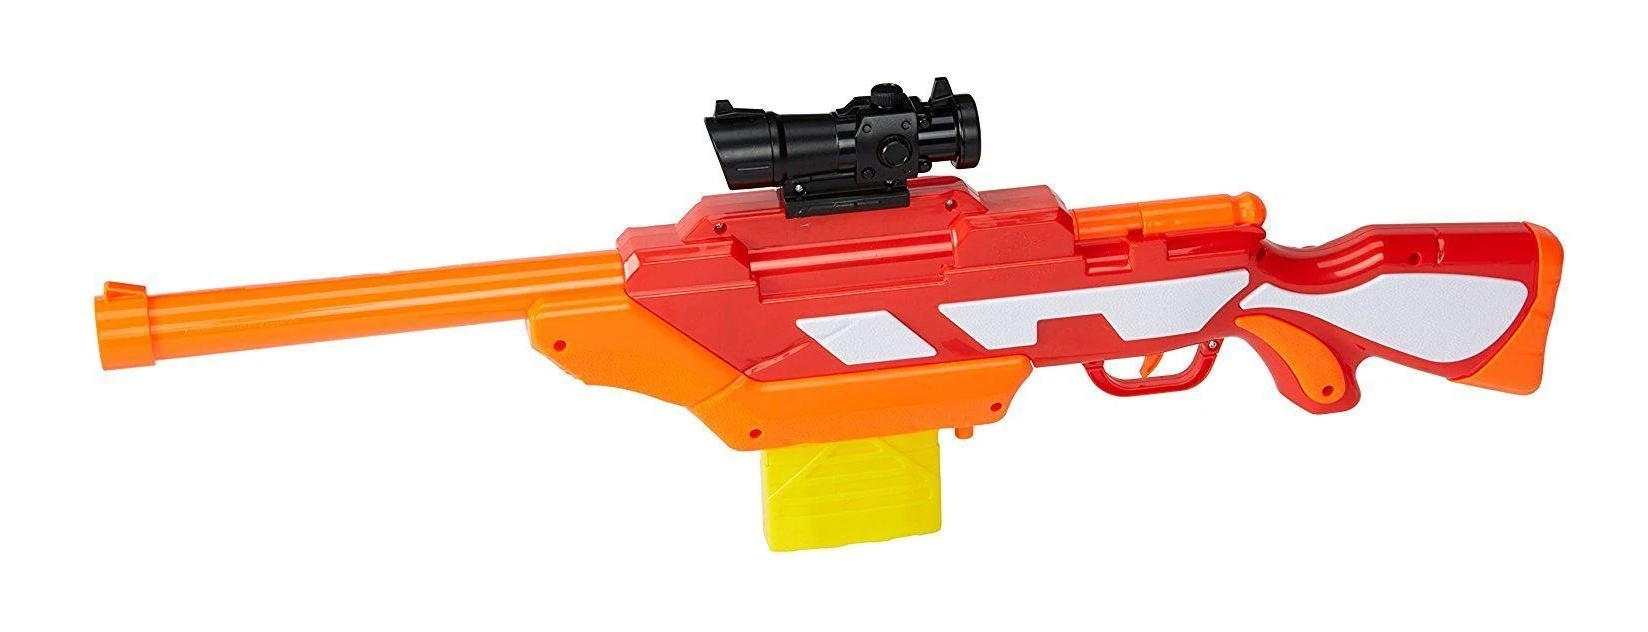 NEW Air Warriors Tactical Storm Clip Fed Foam Dart Rifle Blaster